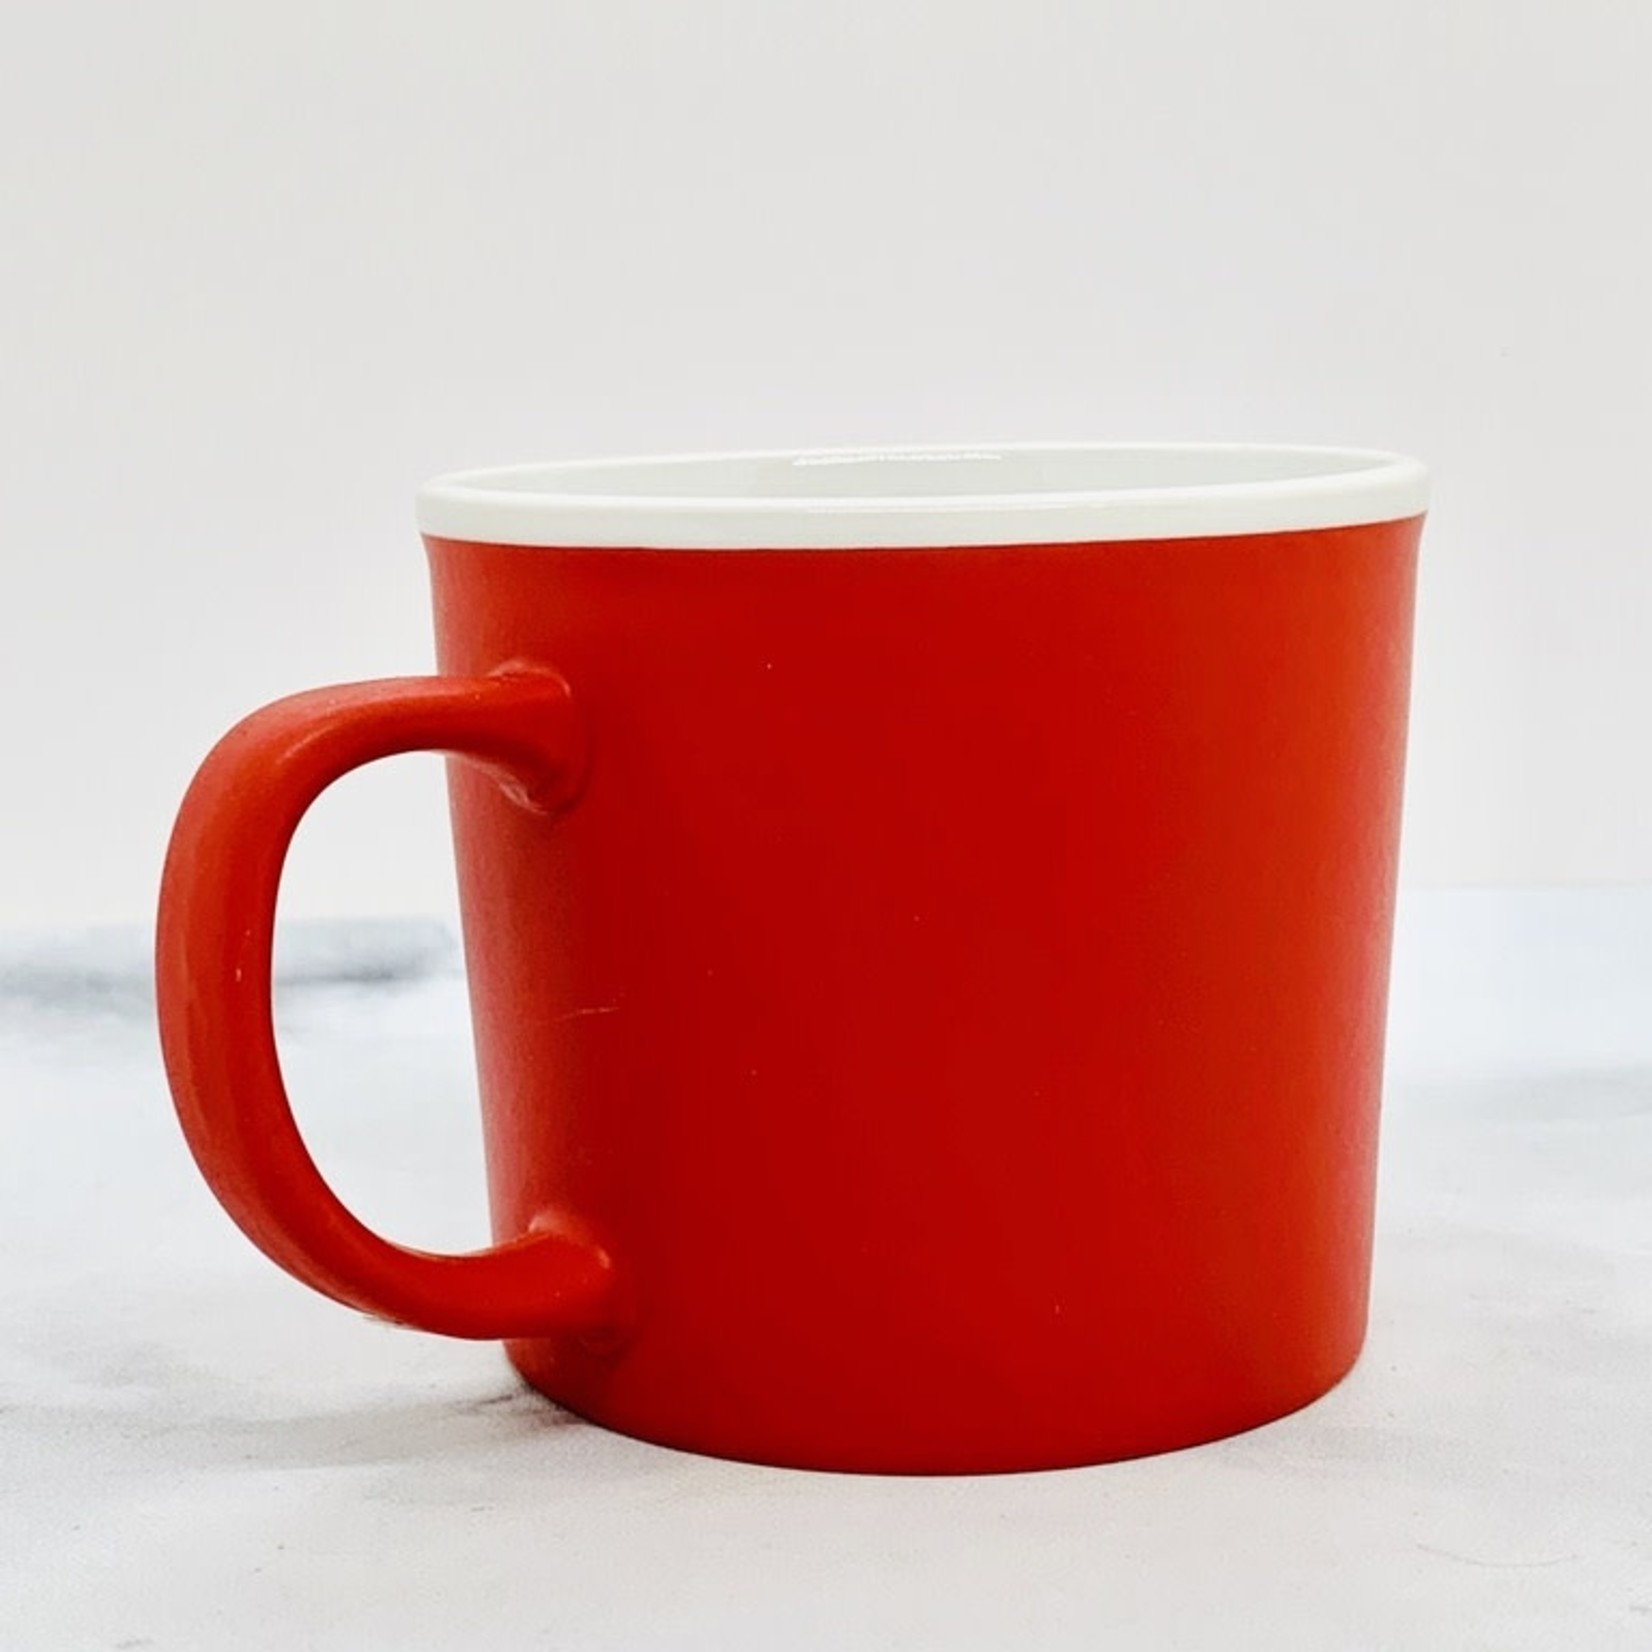 Per My Previous Email, Asshole Mug